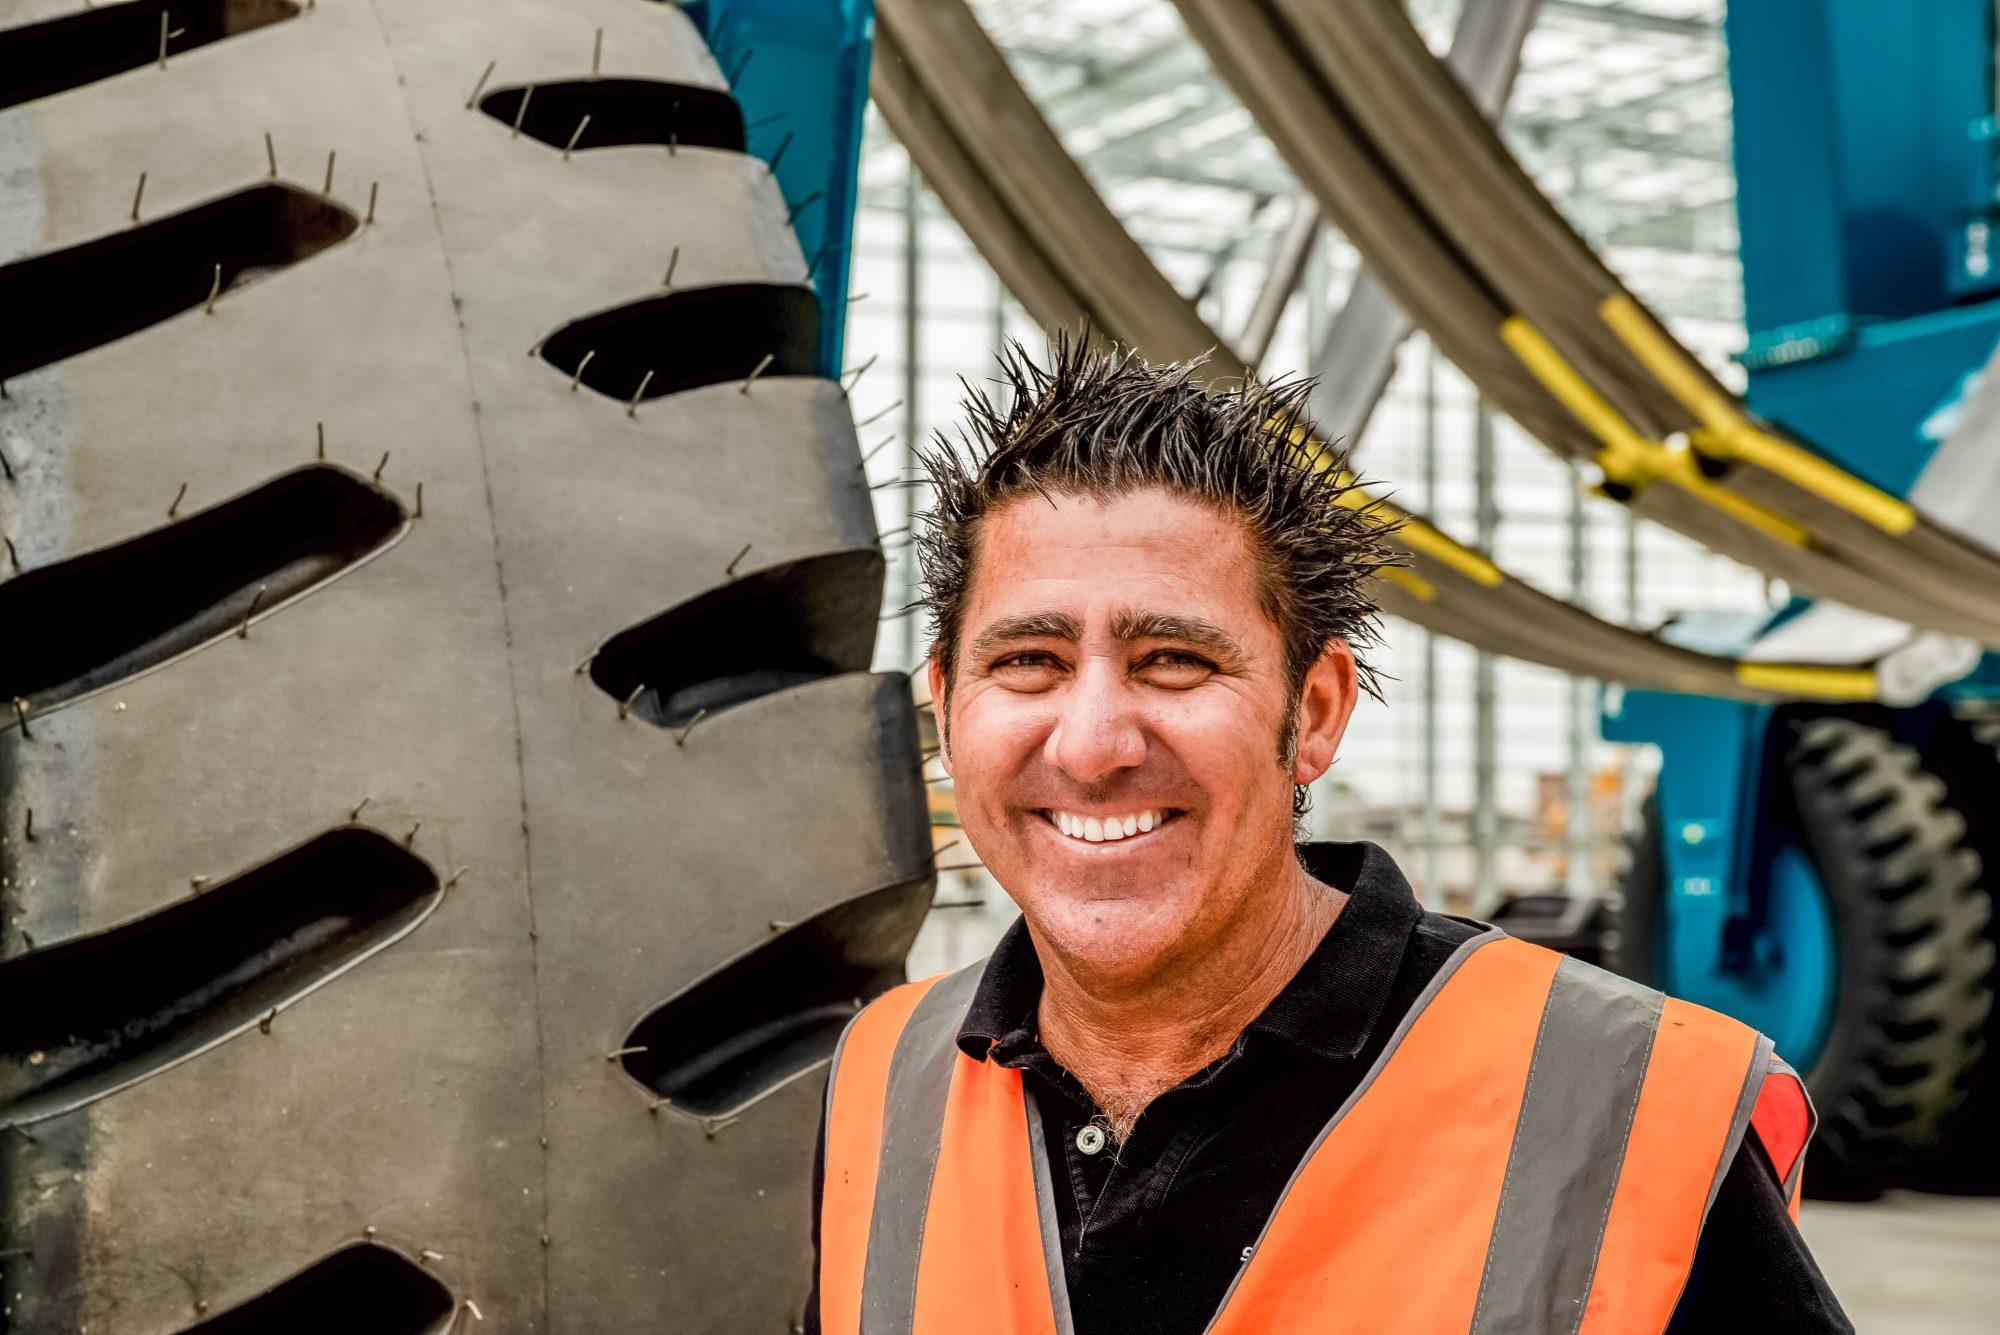 Shane Subichin General Manager 300 tonne Shiplift